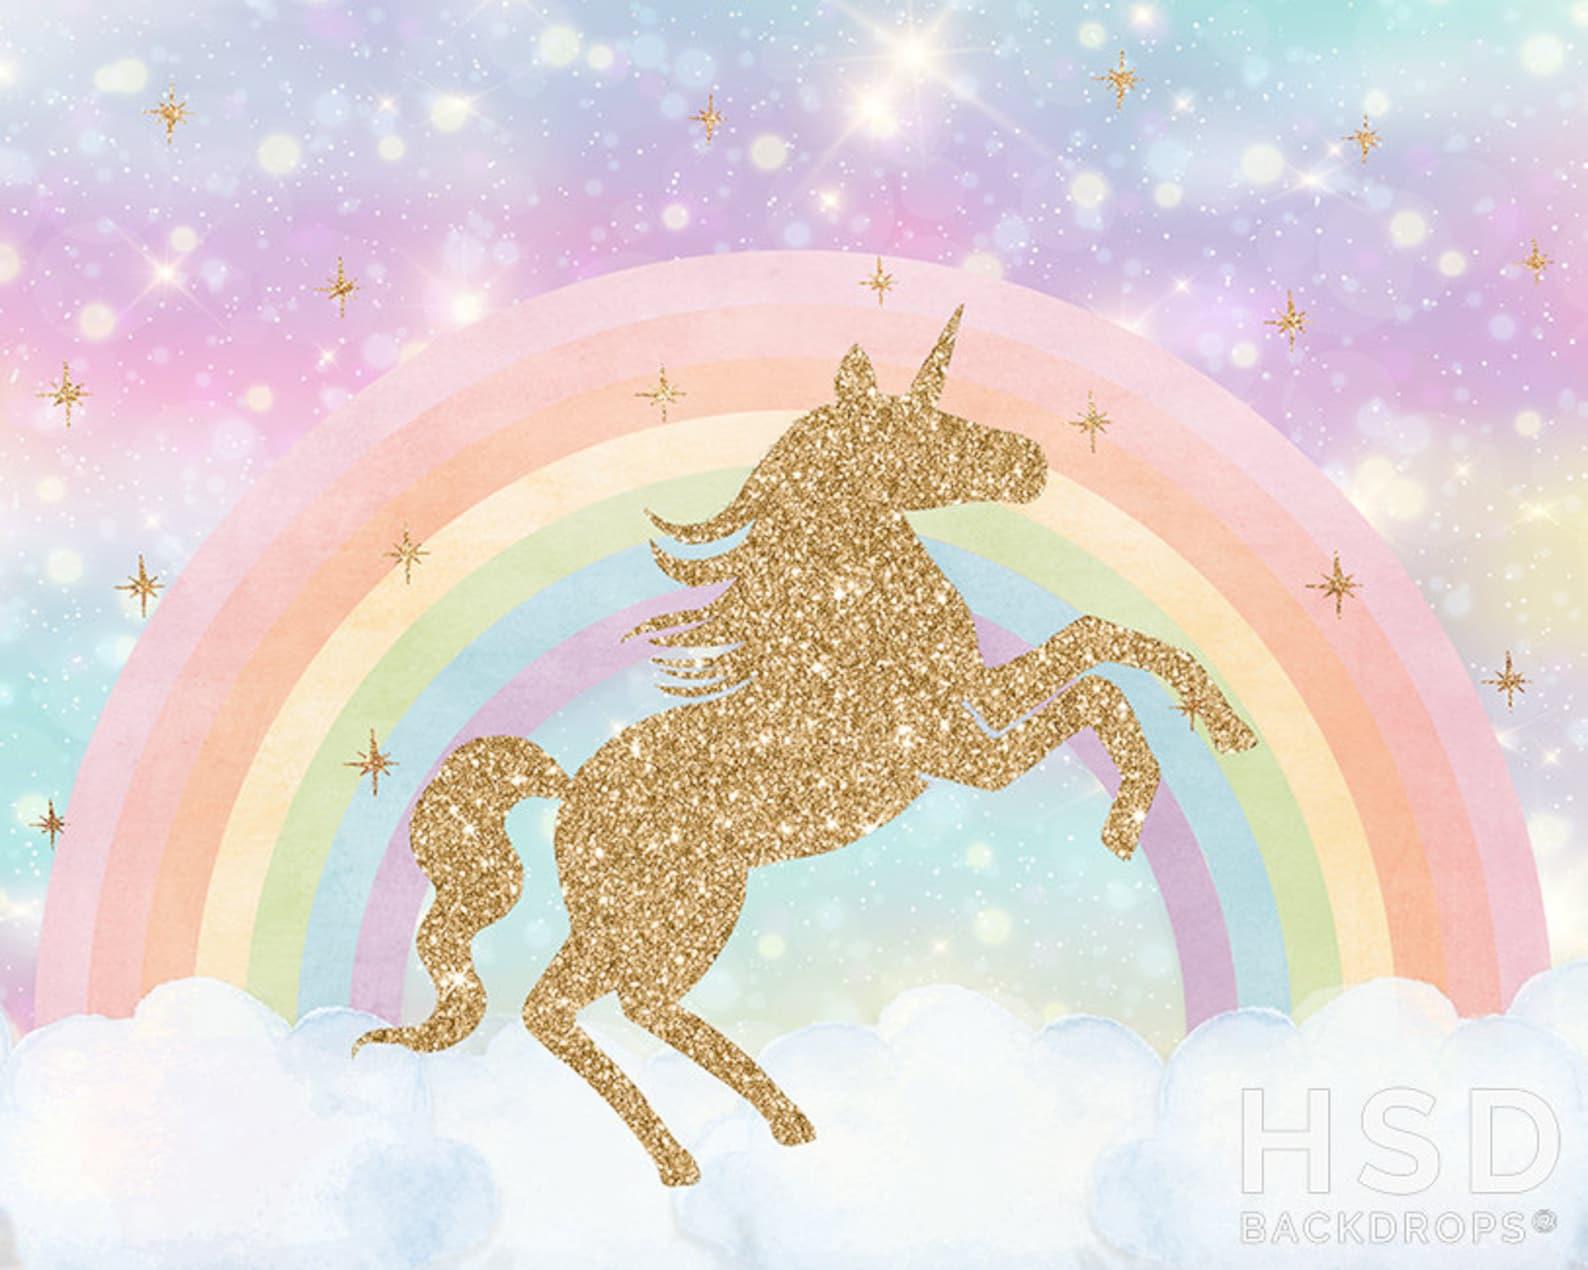 Unicorn Party Backdrops 8×4 Ft